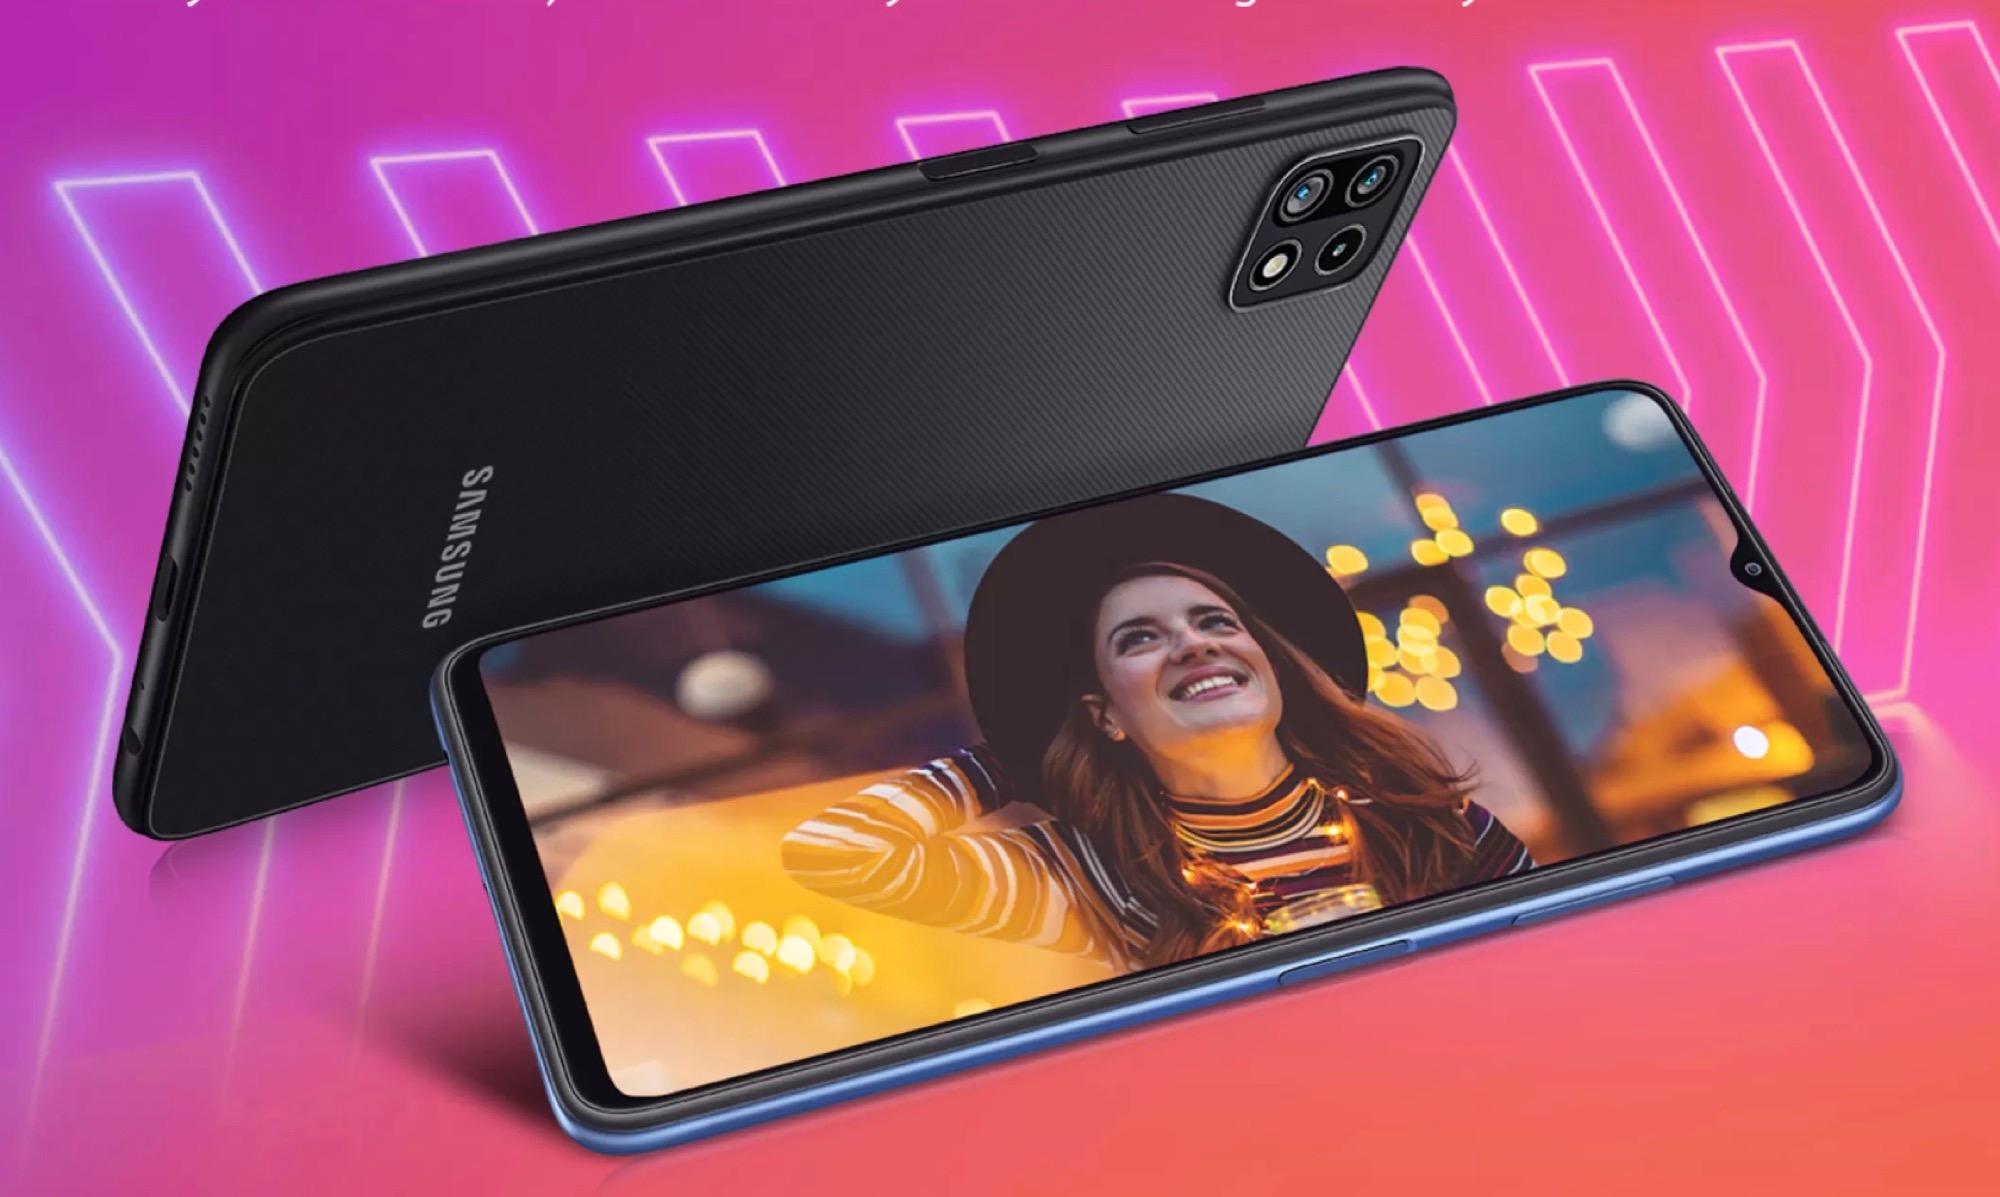 Samsung enthüllt das Design des Galaxy F42 5G mit 5.000 mAh Akku und 64 MP Triple-Kamera